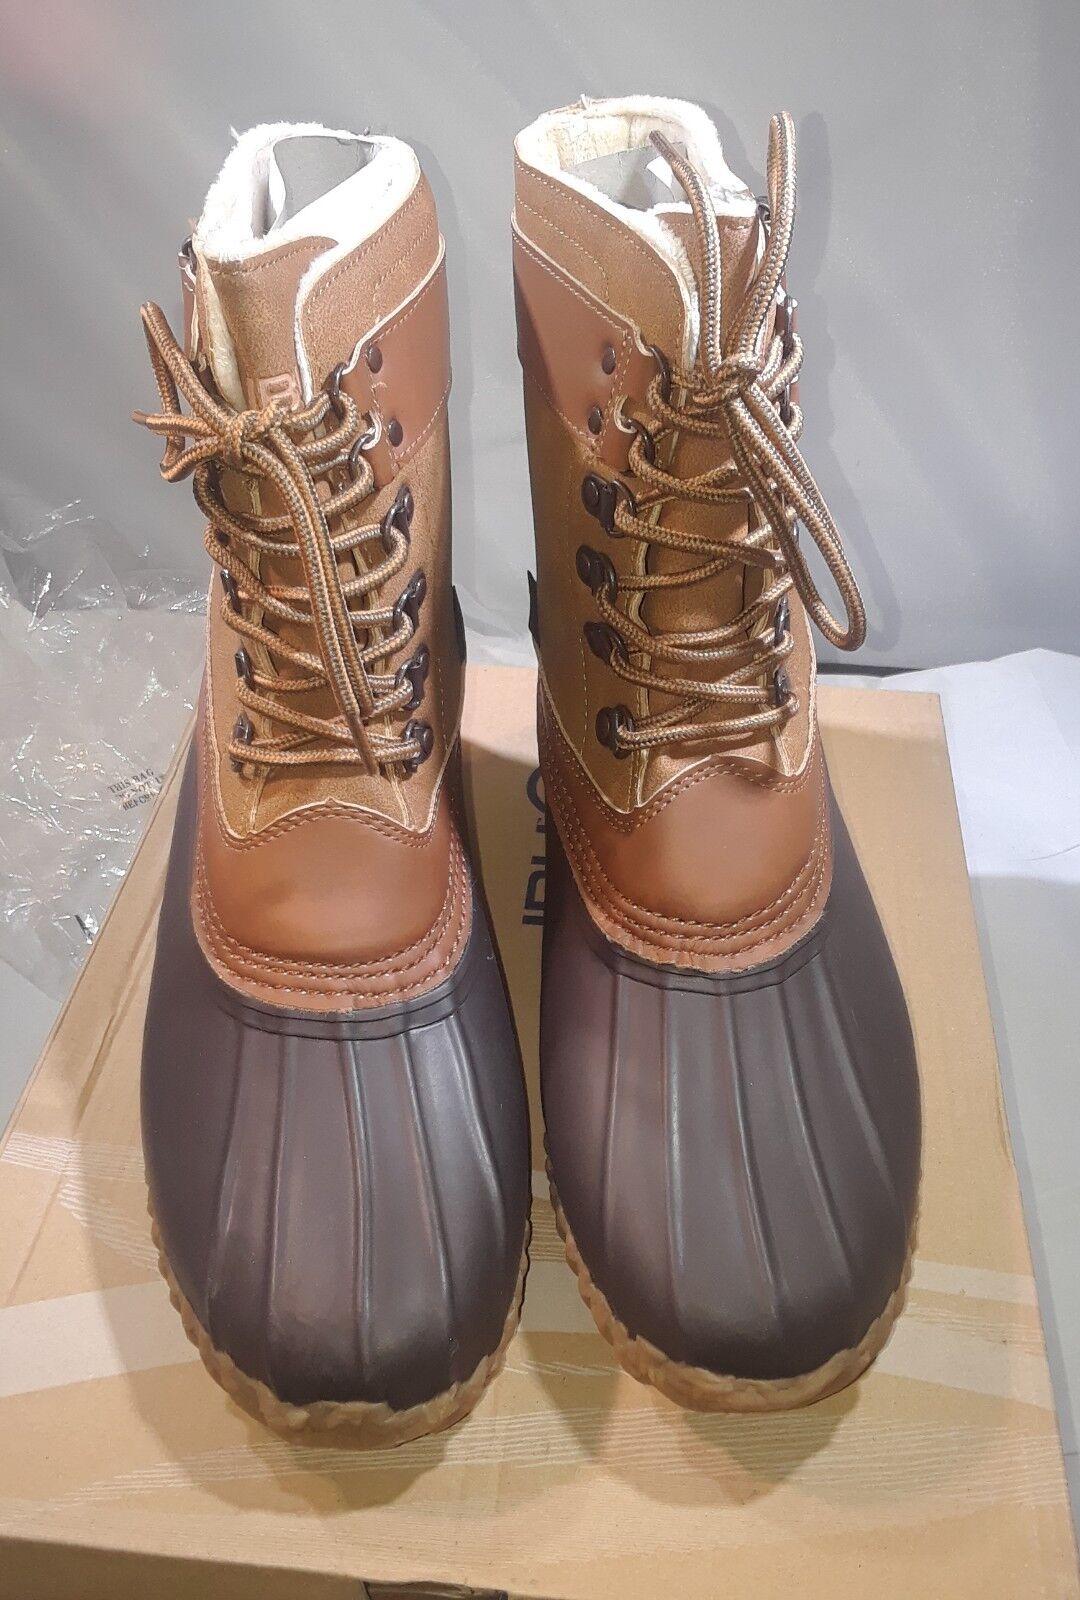 Women's Rubber Boot Nova Scotia - JBU Size 9